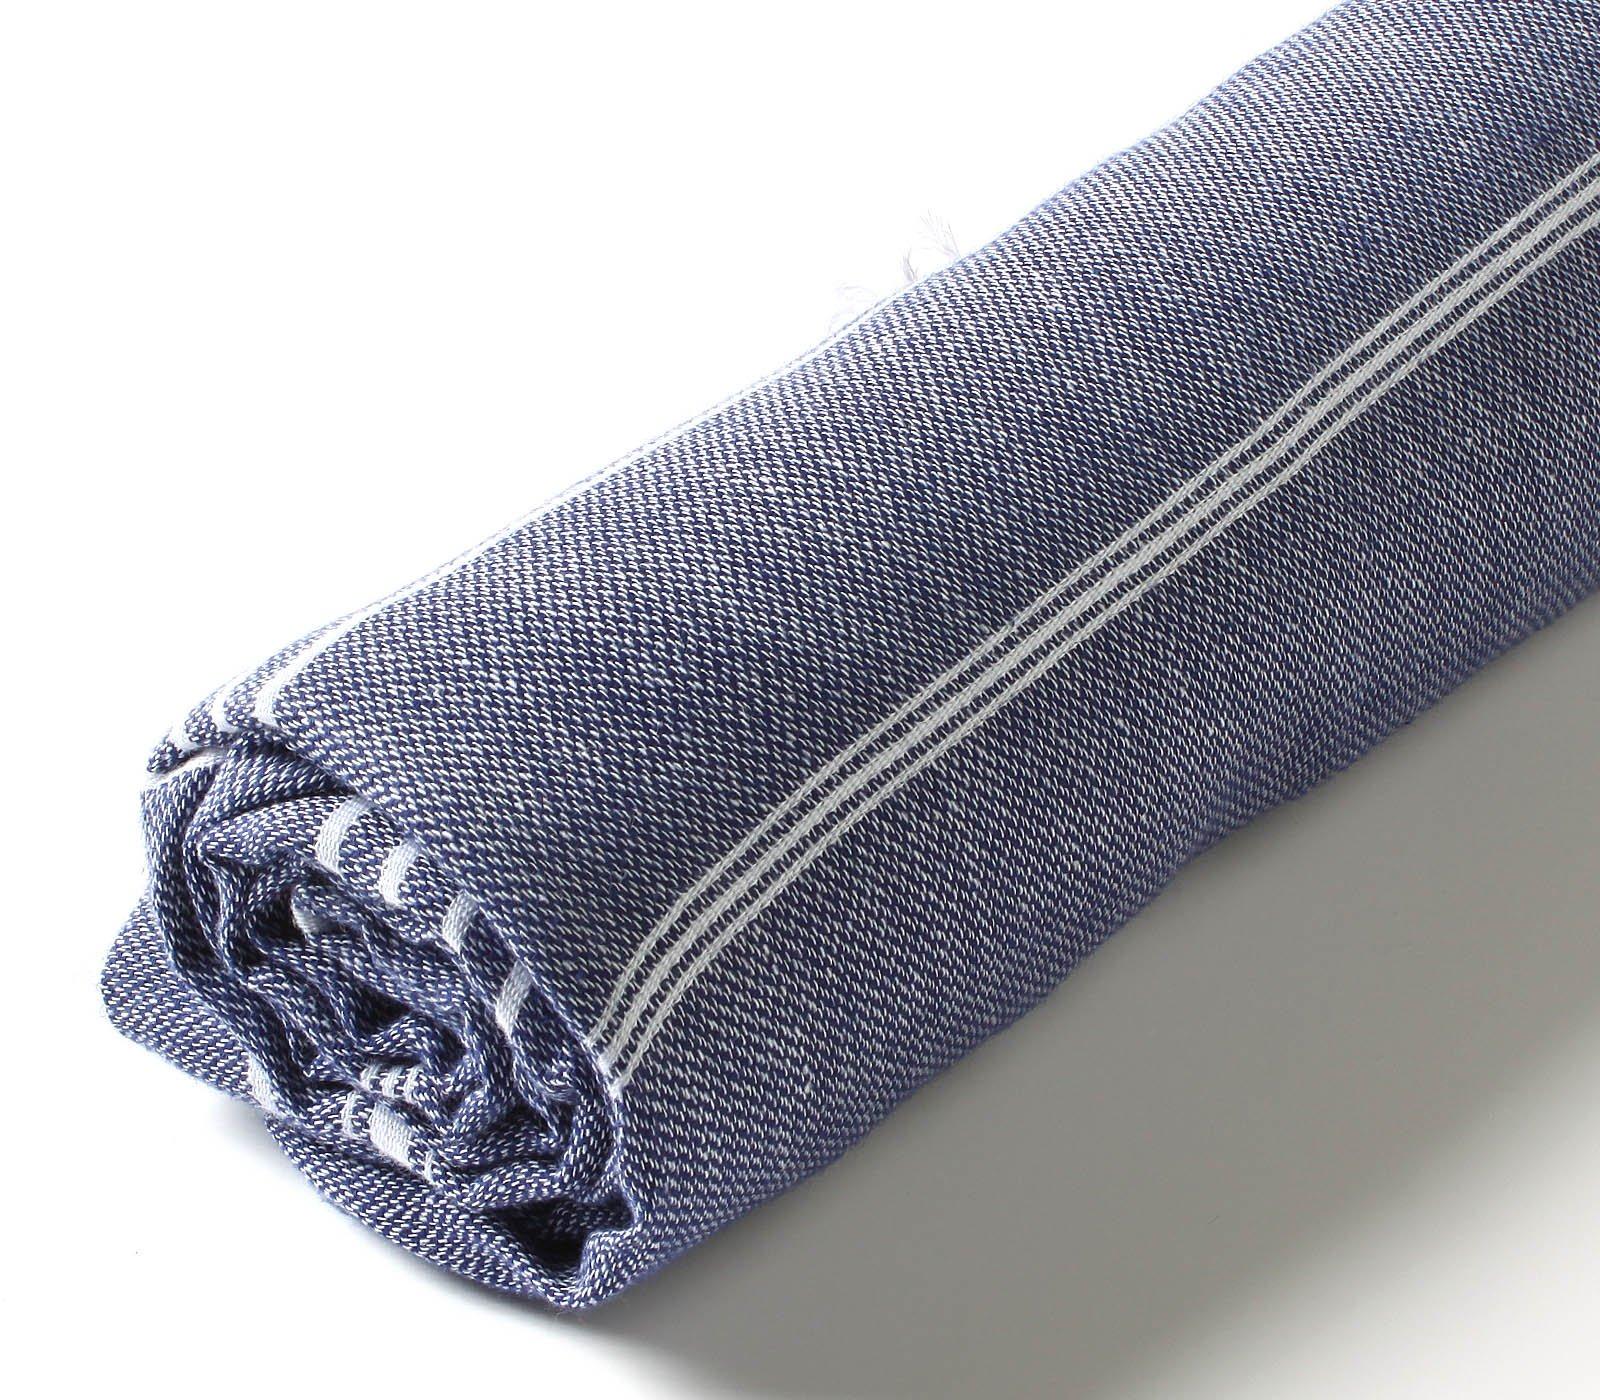 Cacala 100% Cotton Pestemal Turkish Bath Towel, 37 x 70, Dark Blue by Cacala (Image #3)